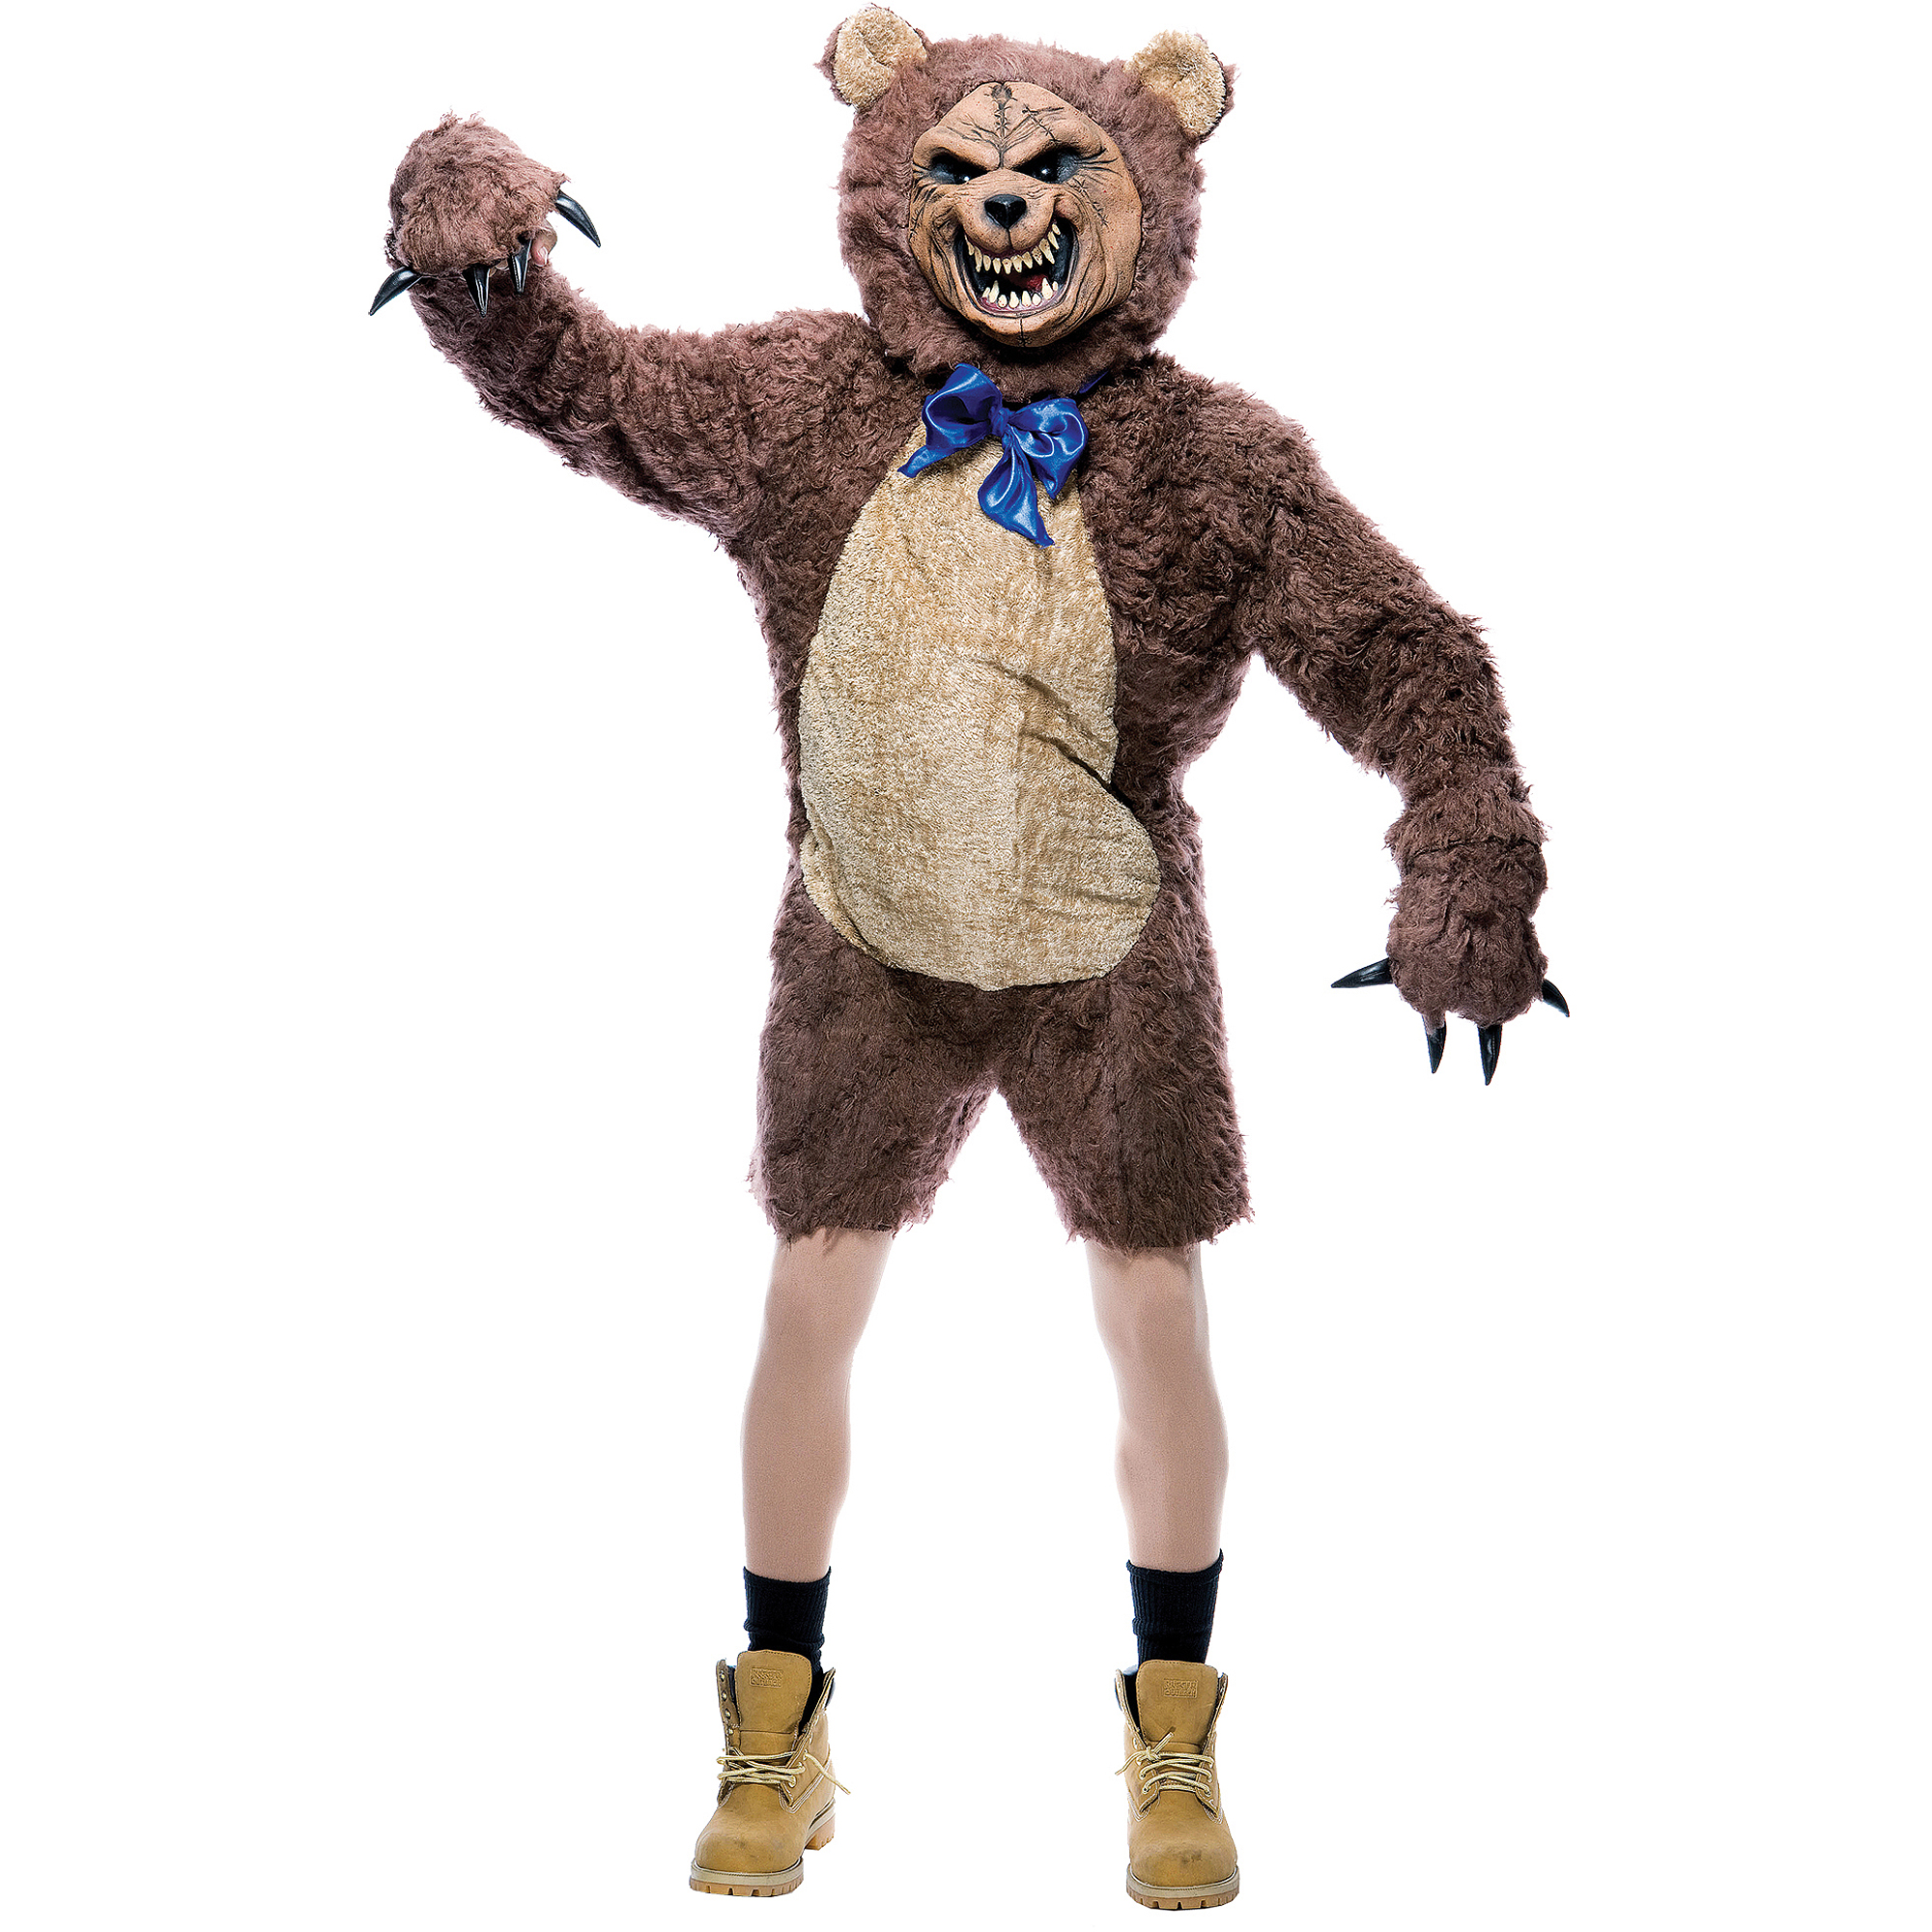 cuddles the bear adult halloween costume - walmart